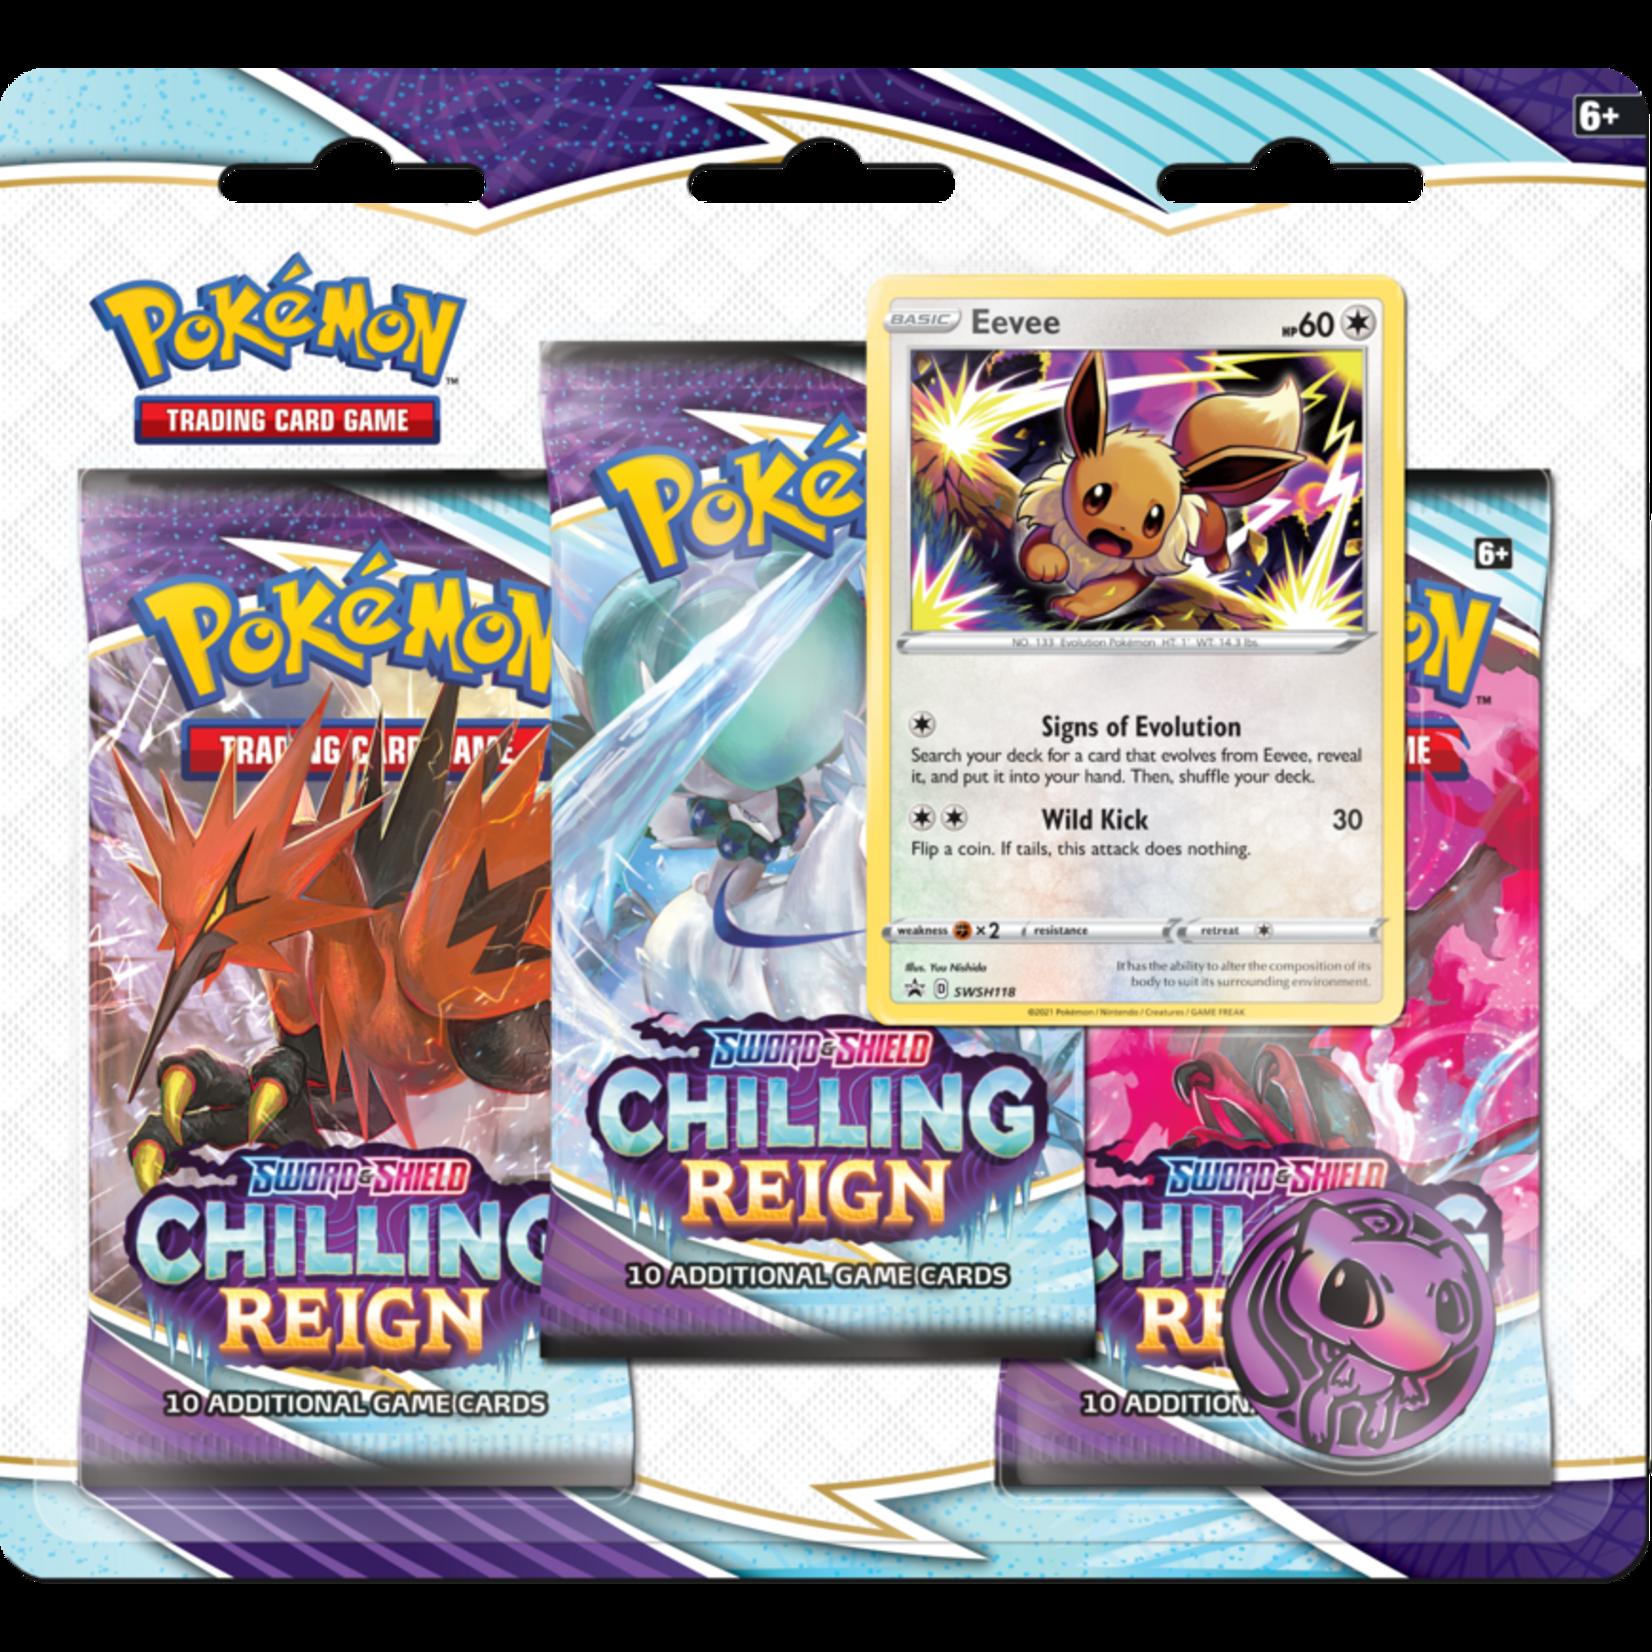 Pokémon Pokémon TCG: Sword & Shield—Chilling Reign Three-Booster Blister